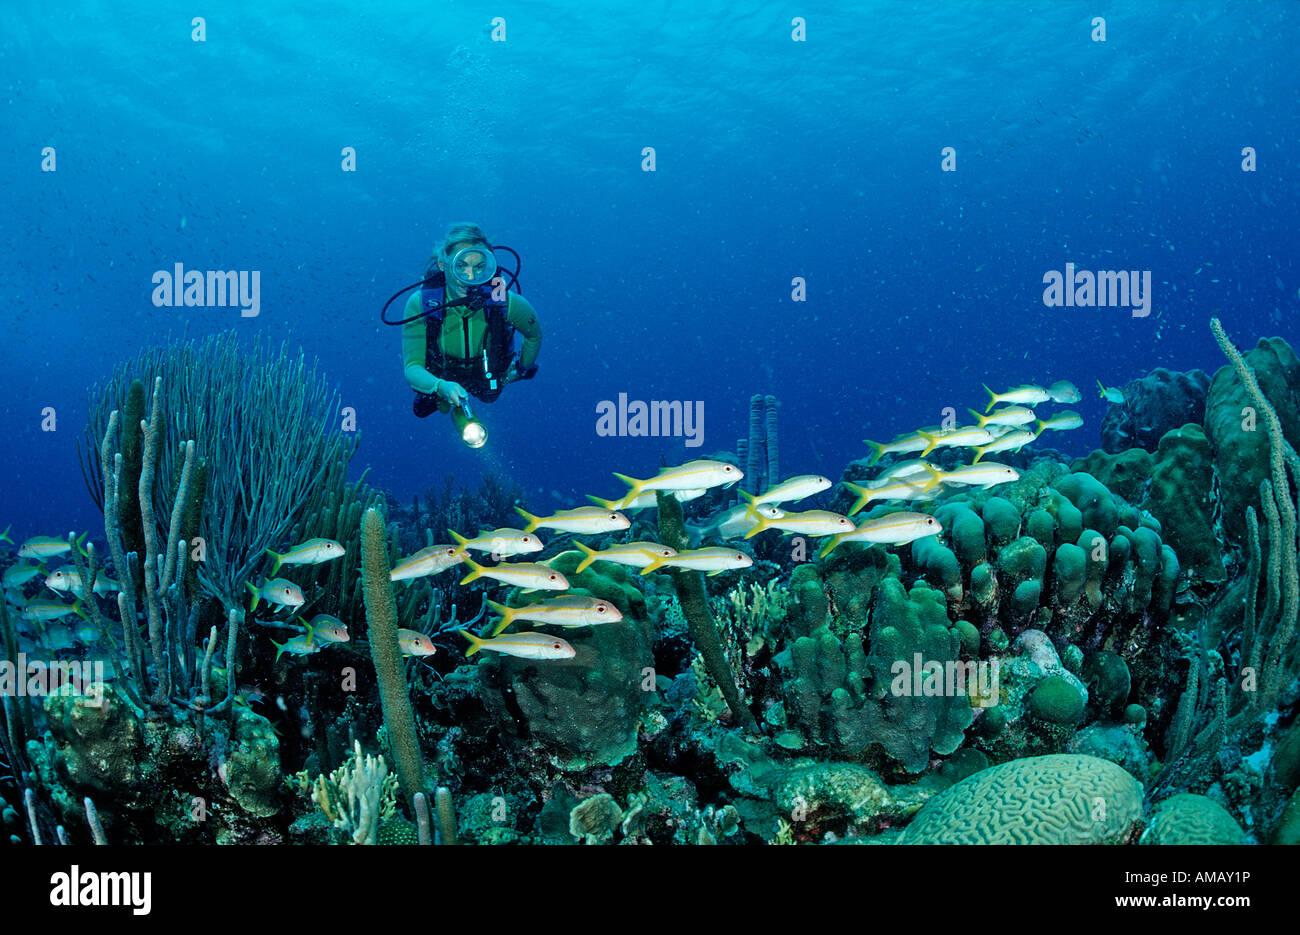 Scuba Diver e giallo Goatfishes Mulloidichthys martinicus Antille Olandesi Bonaire Mar dei Caraibi Immagini Stock